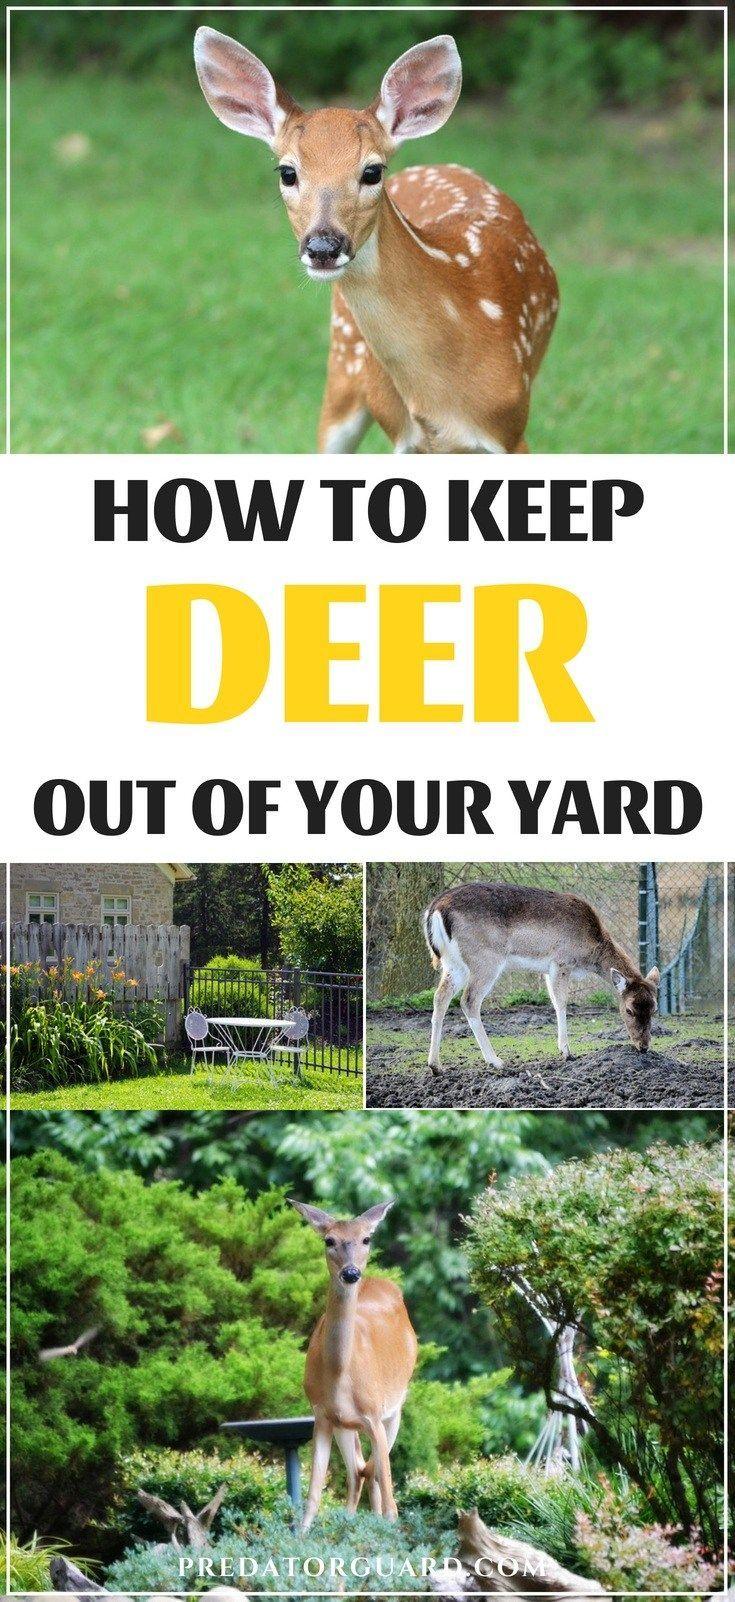 How To Keep Deer Out Of Your Yard Deer Resistant Garden Slugs